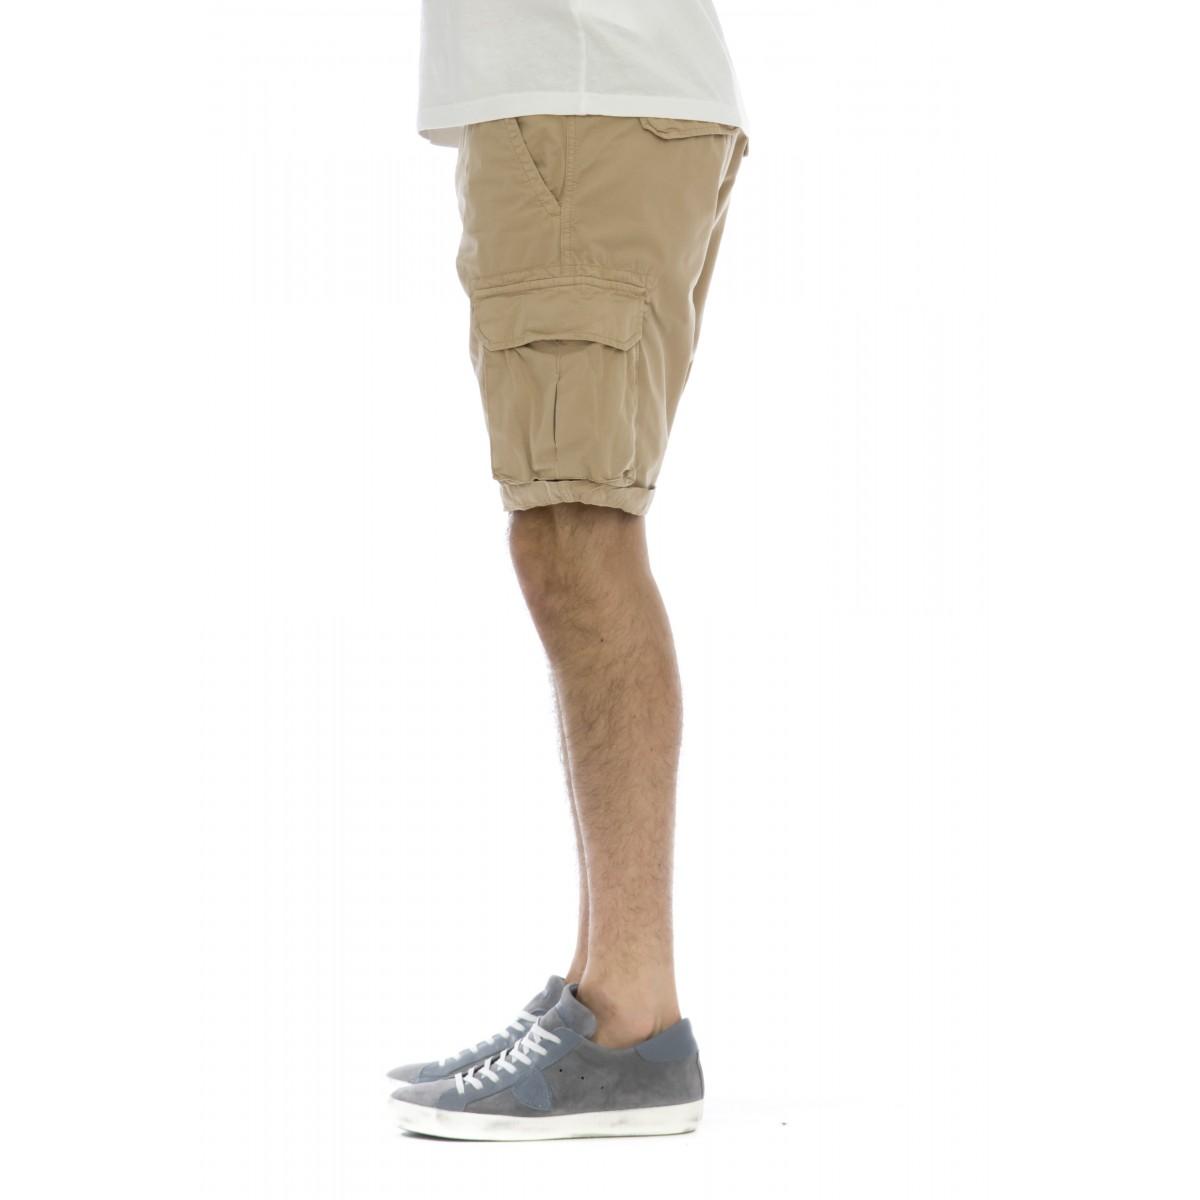 Bermuda uomo - Nick 3746 bermuda tasconato